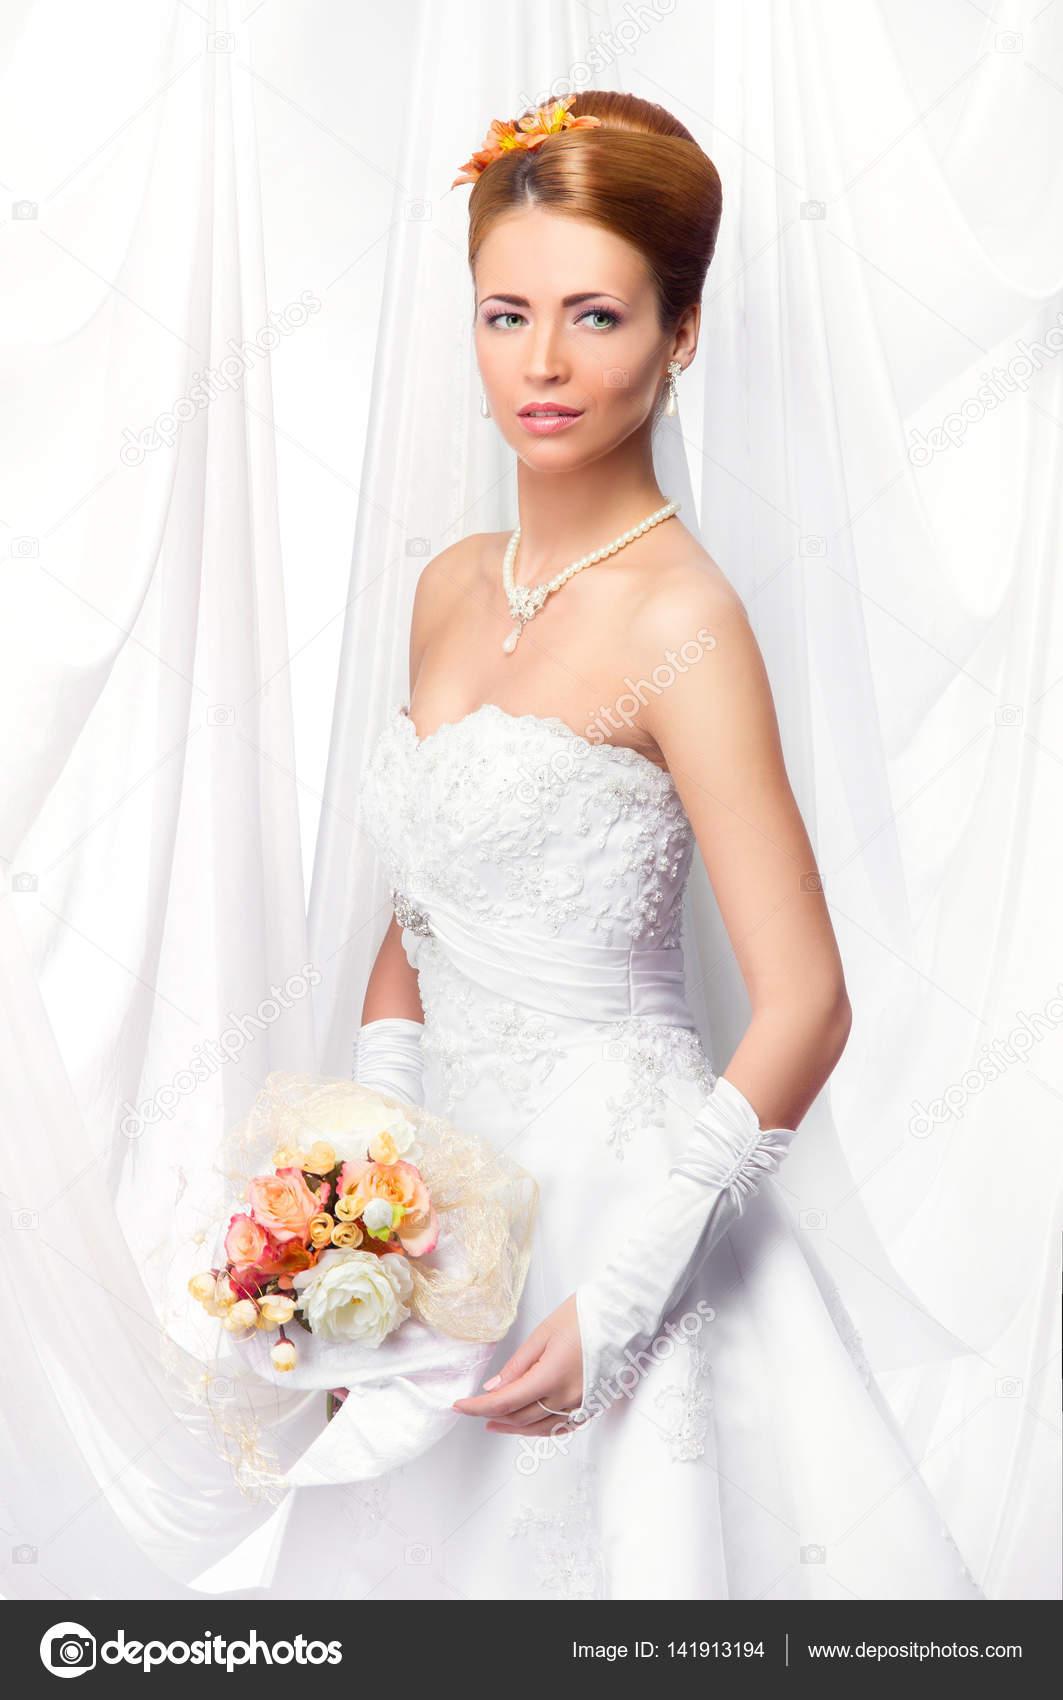 schöne Braut im Hochzeitskleid — Stockfoto © shmeljov #141913194